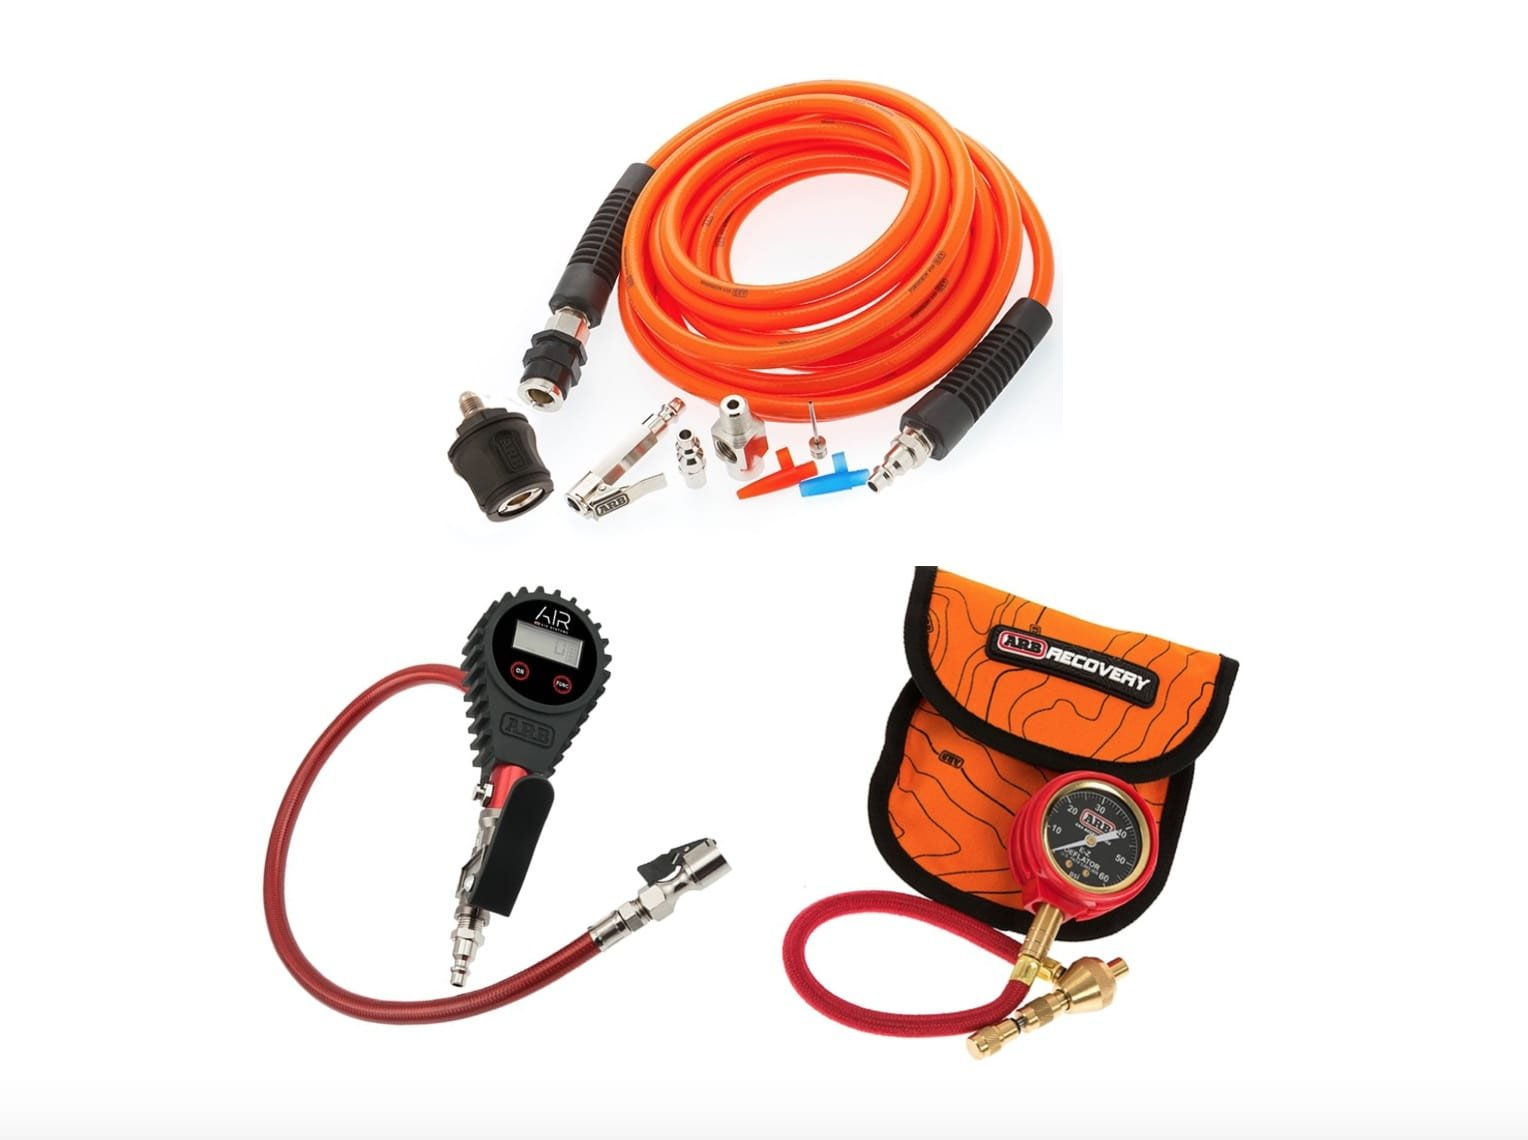 ARB DIGITAL Tire Inflator Bundle w/ Tire Inflation Kit For Air Compressors & E-Z Deflator Kit